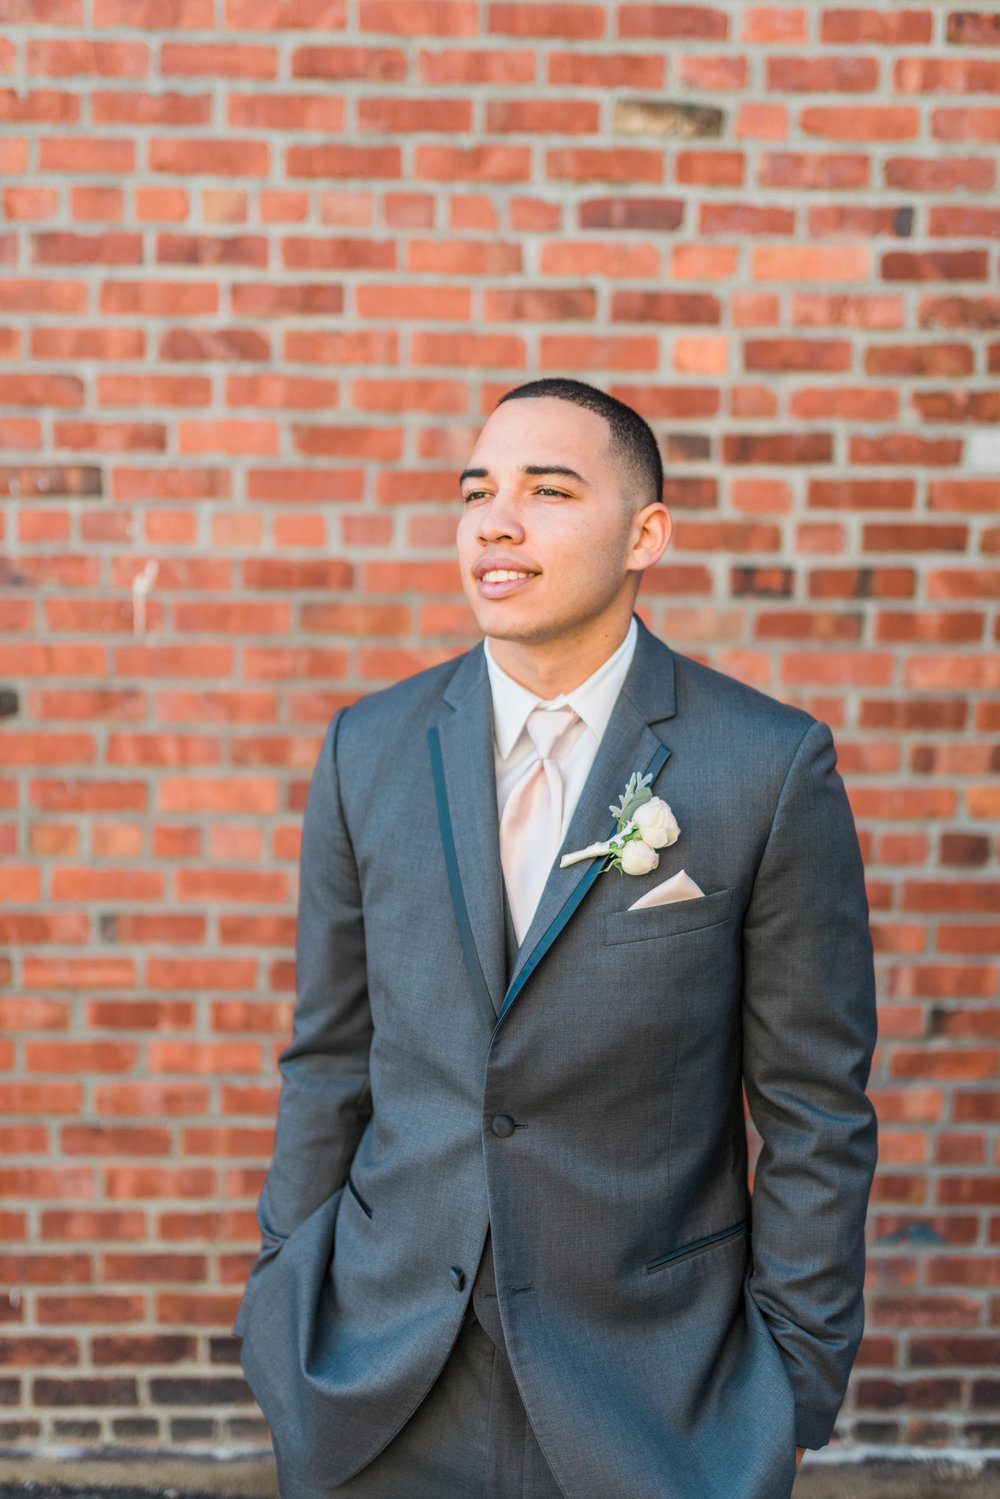 Grace+++Jordan+Wedding+Blog+-+Brooke+Summers+Photography-6.jpg